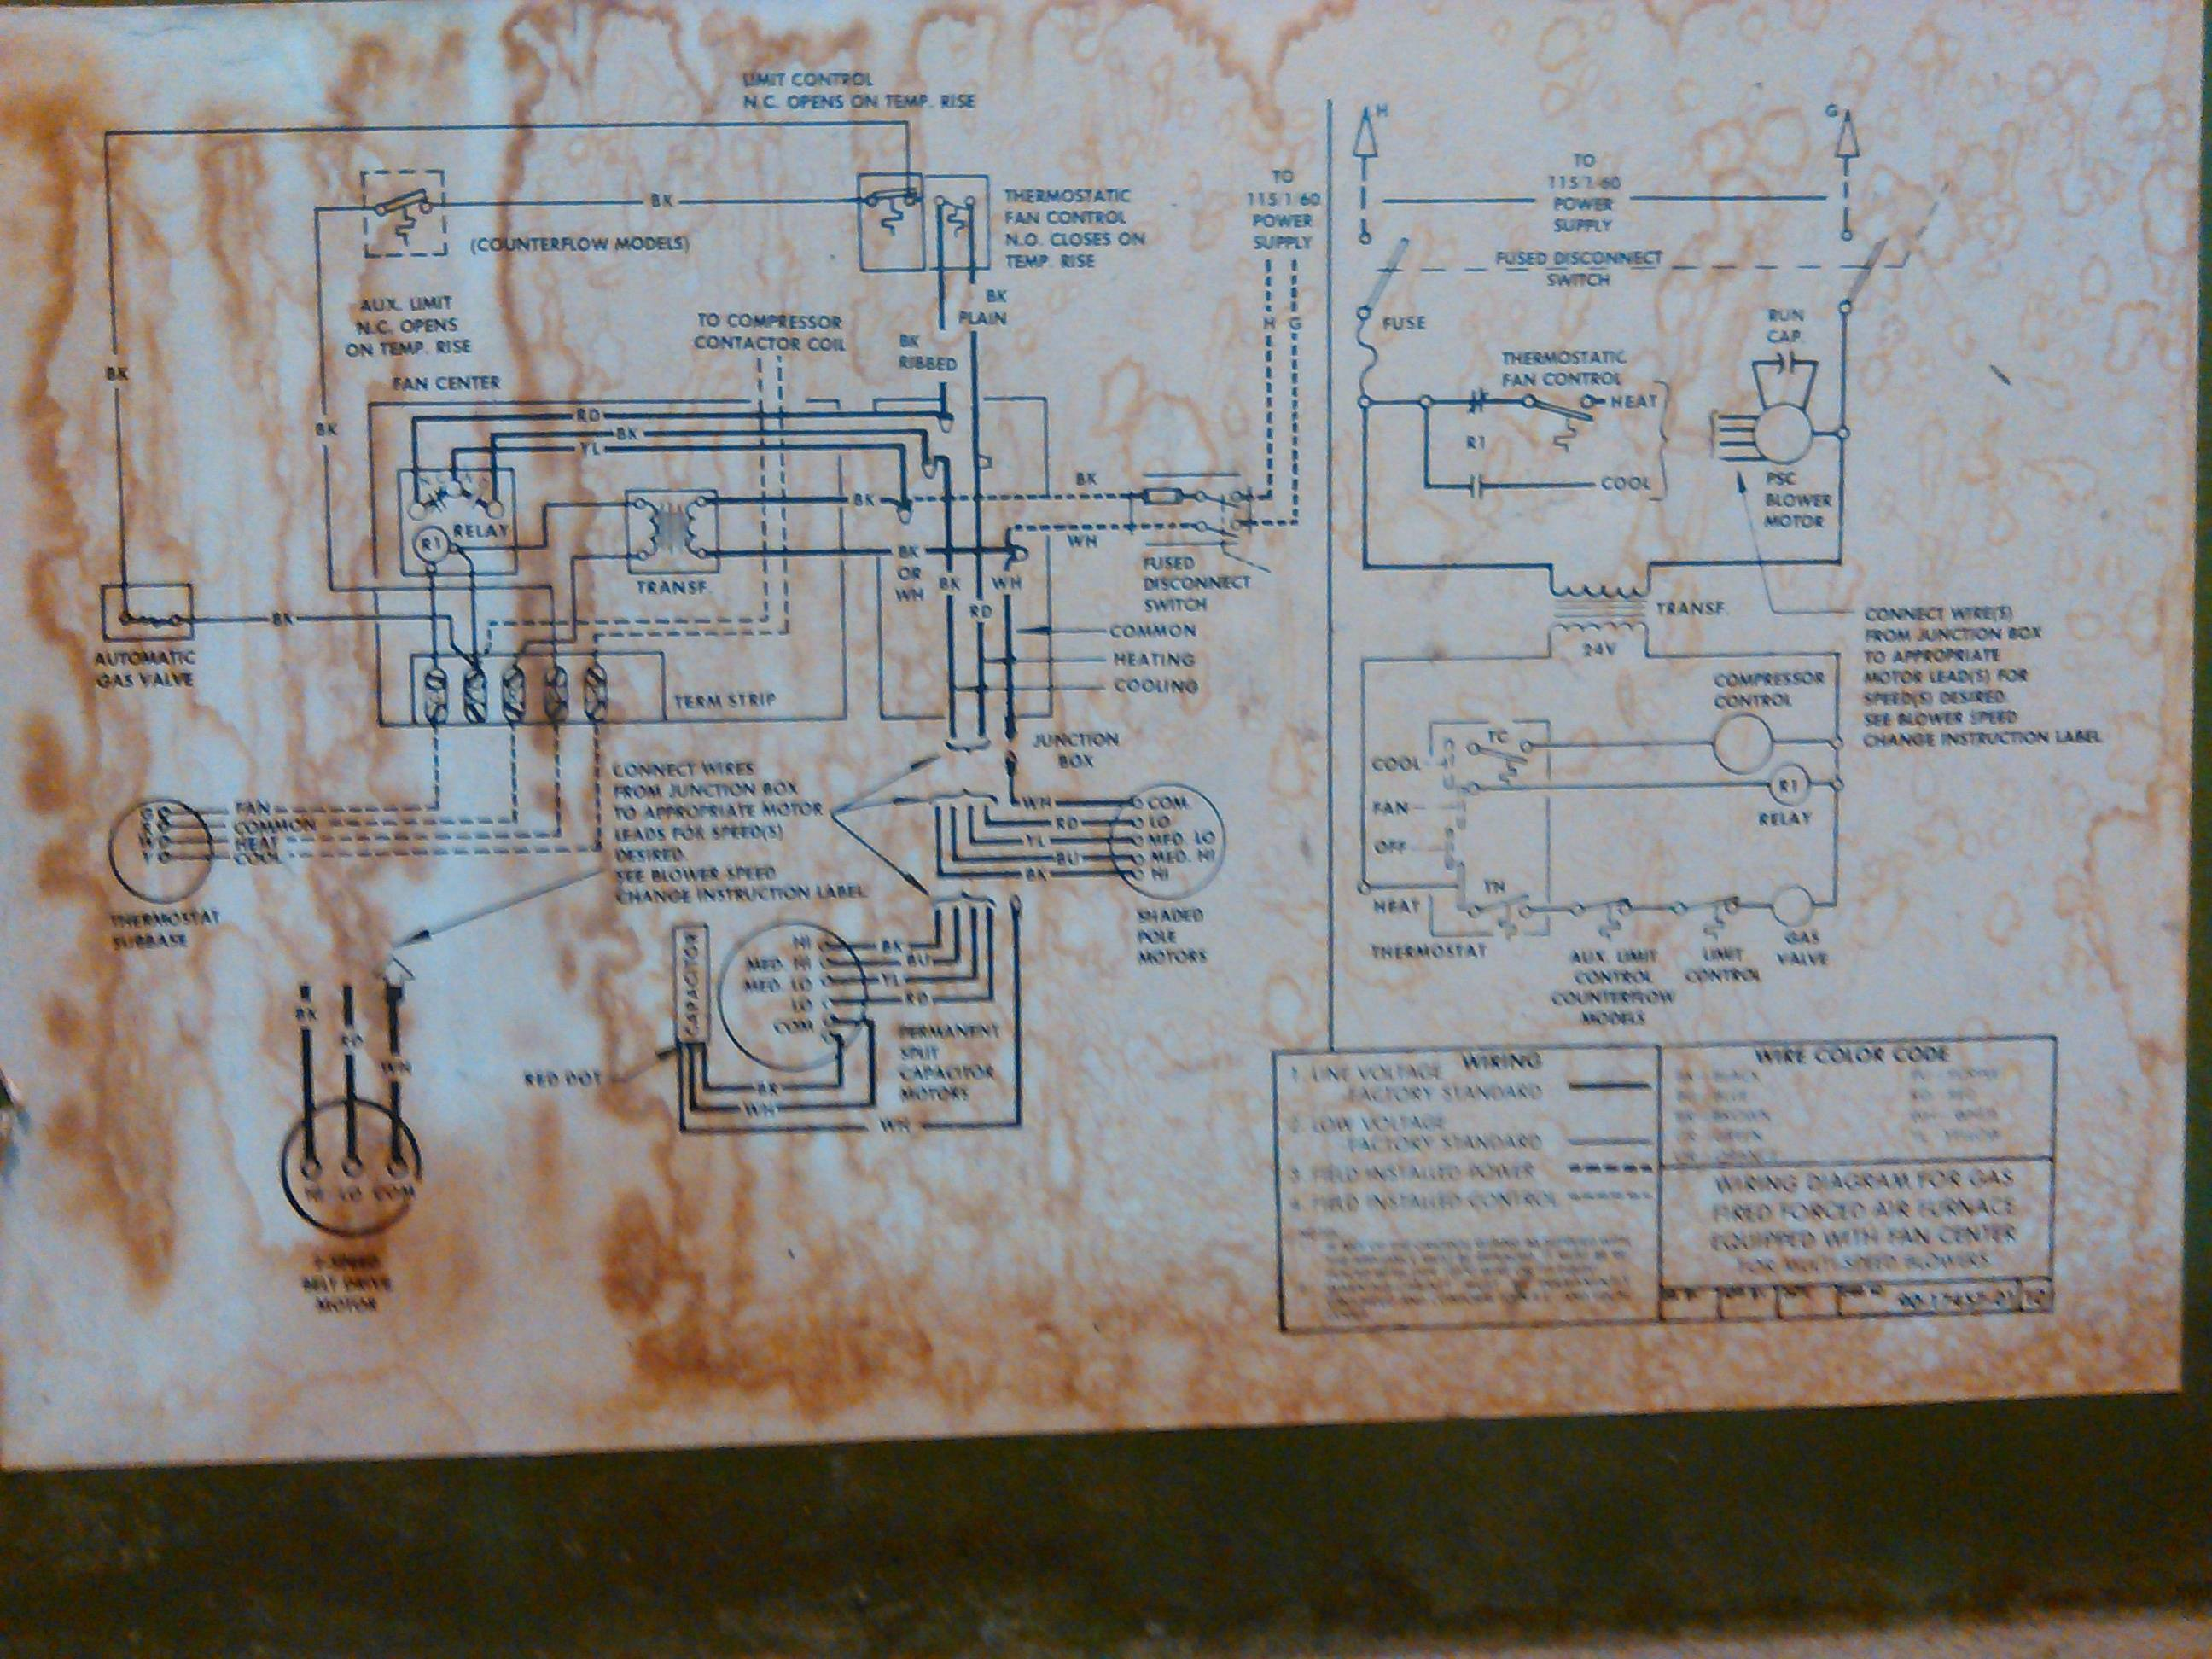 DIAGRAM] Mars Blower Motor 10585 Wiring Diagram FULL Version HD Quality Wiring  Diagram - SHOETFUSE7253.FUJIYA.ITshoetfuse7253.fujiya.it